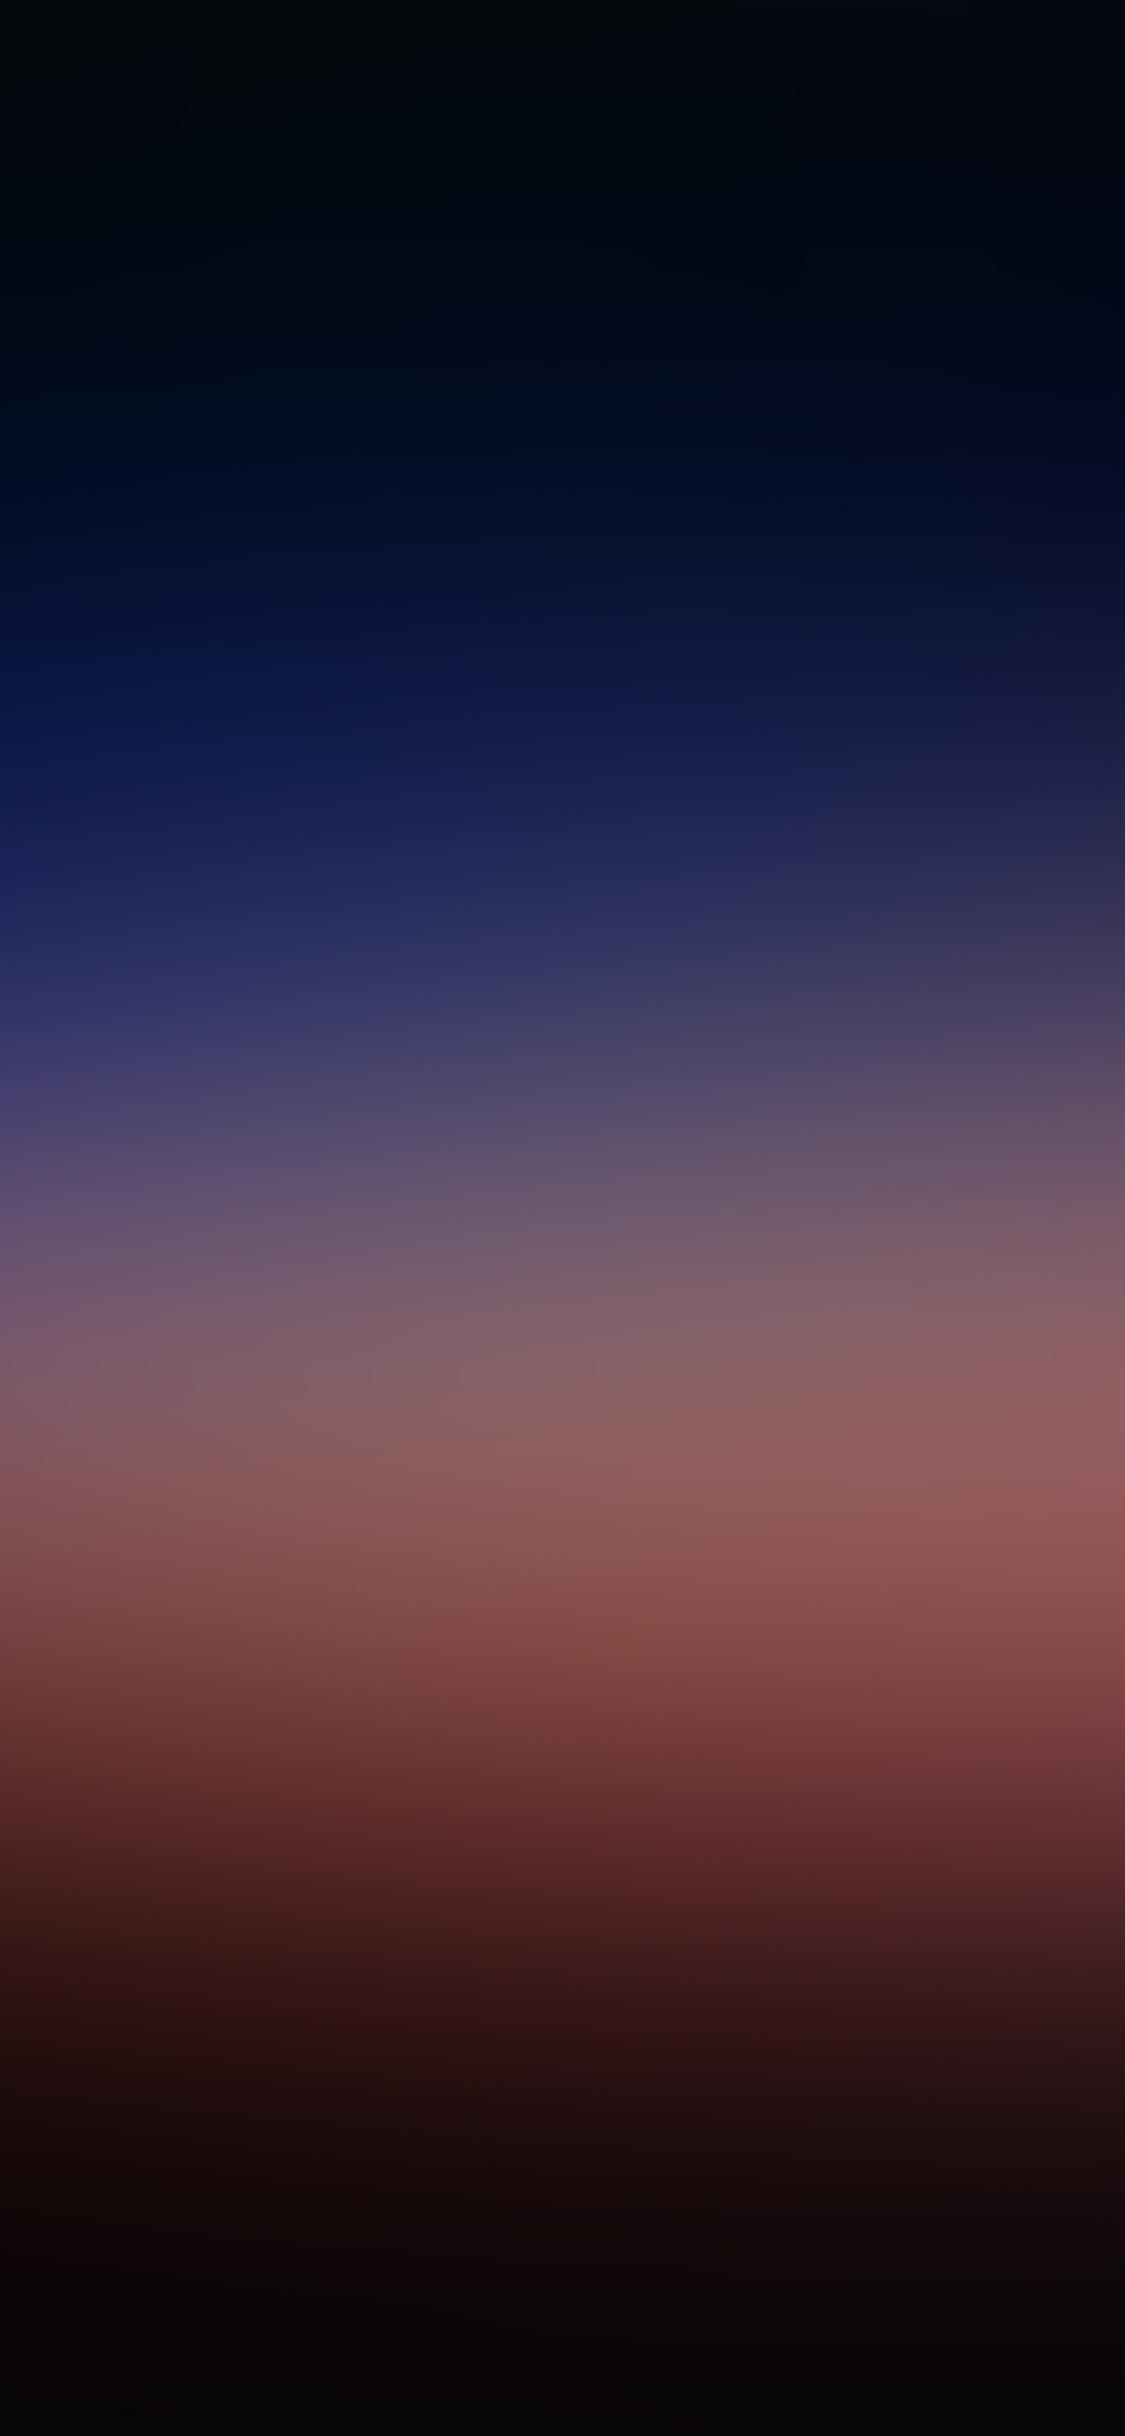 iPhoneXpapers.com-Apple-iPhone-wallpaper-sj19-win-fail-lose-red-blue-gradation-blur